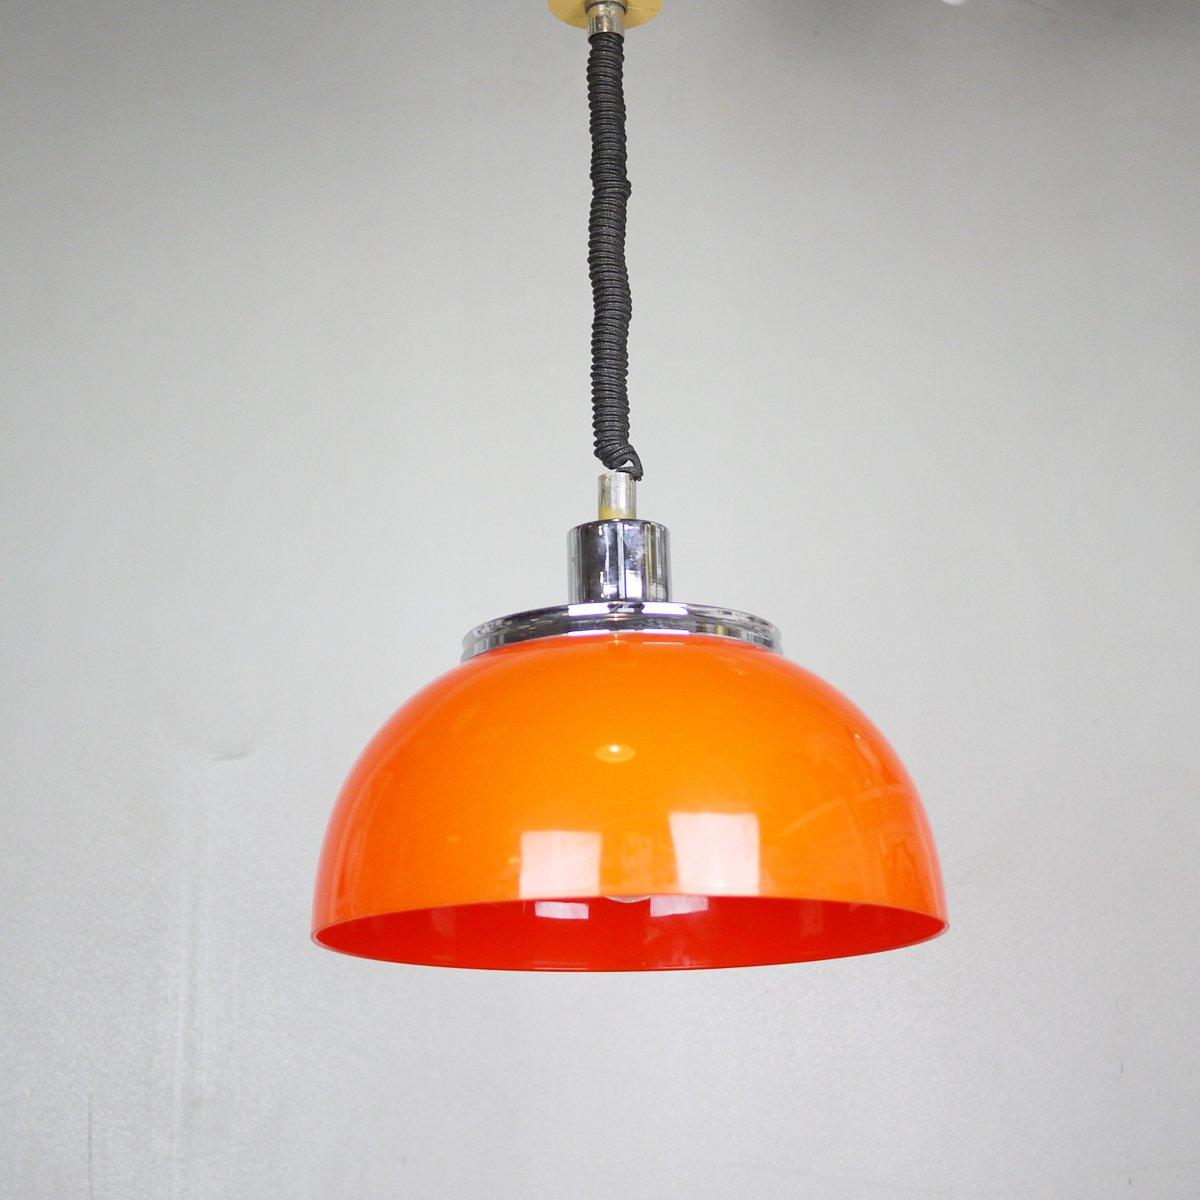 Mid century pull down orange pendant light from meblo for sale at pamono mid century pull down orange pendant light from meblo mozeypictures Gallery